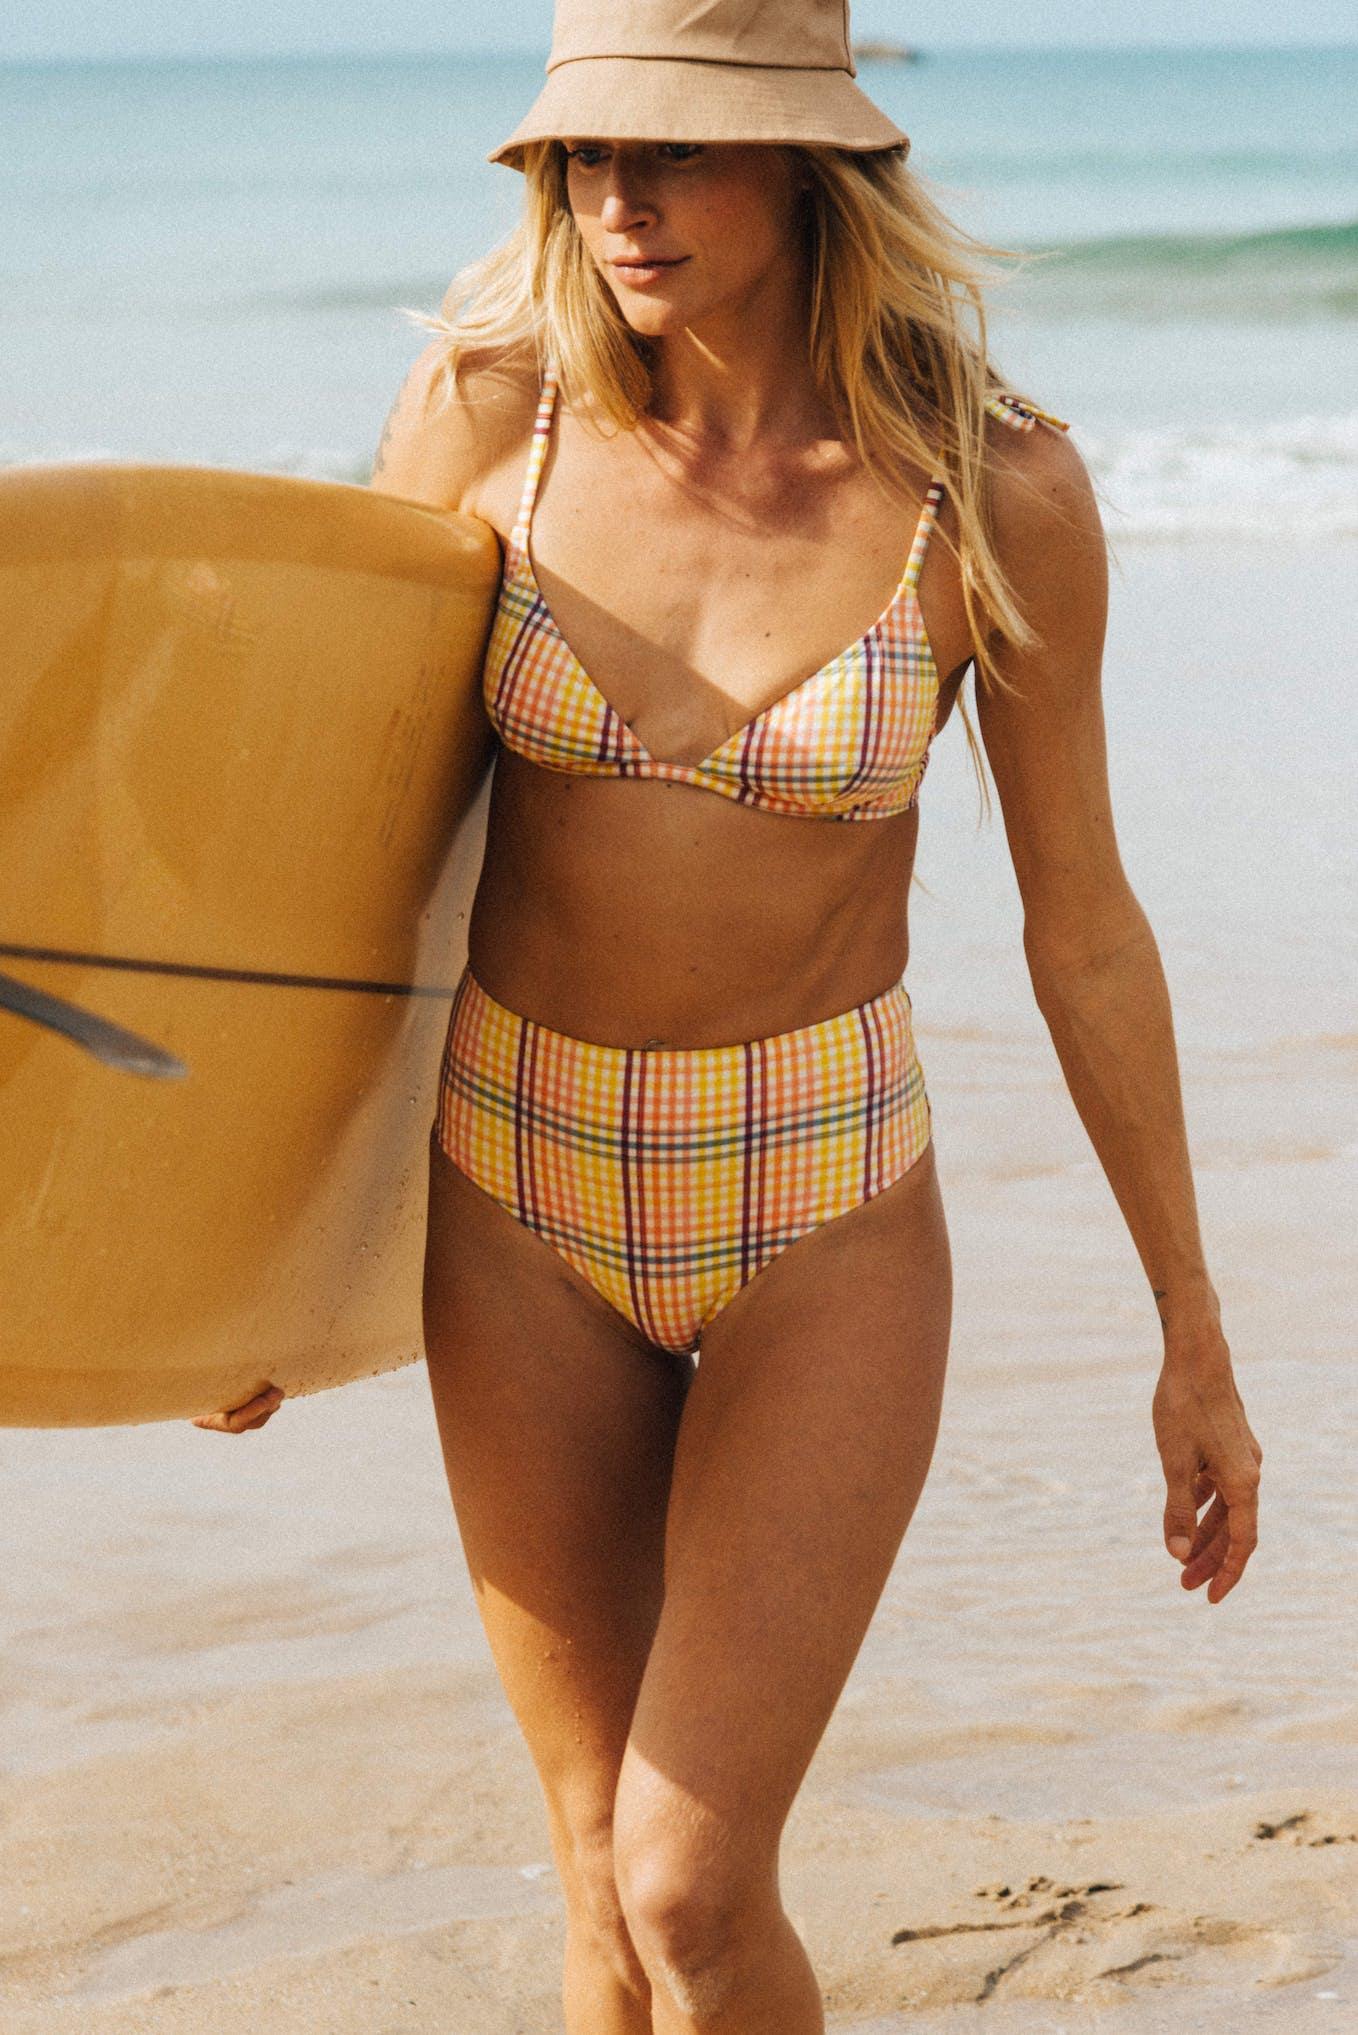 Soleil sur l'eau Bikini with yellow graphic print